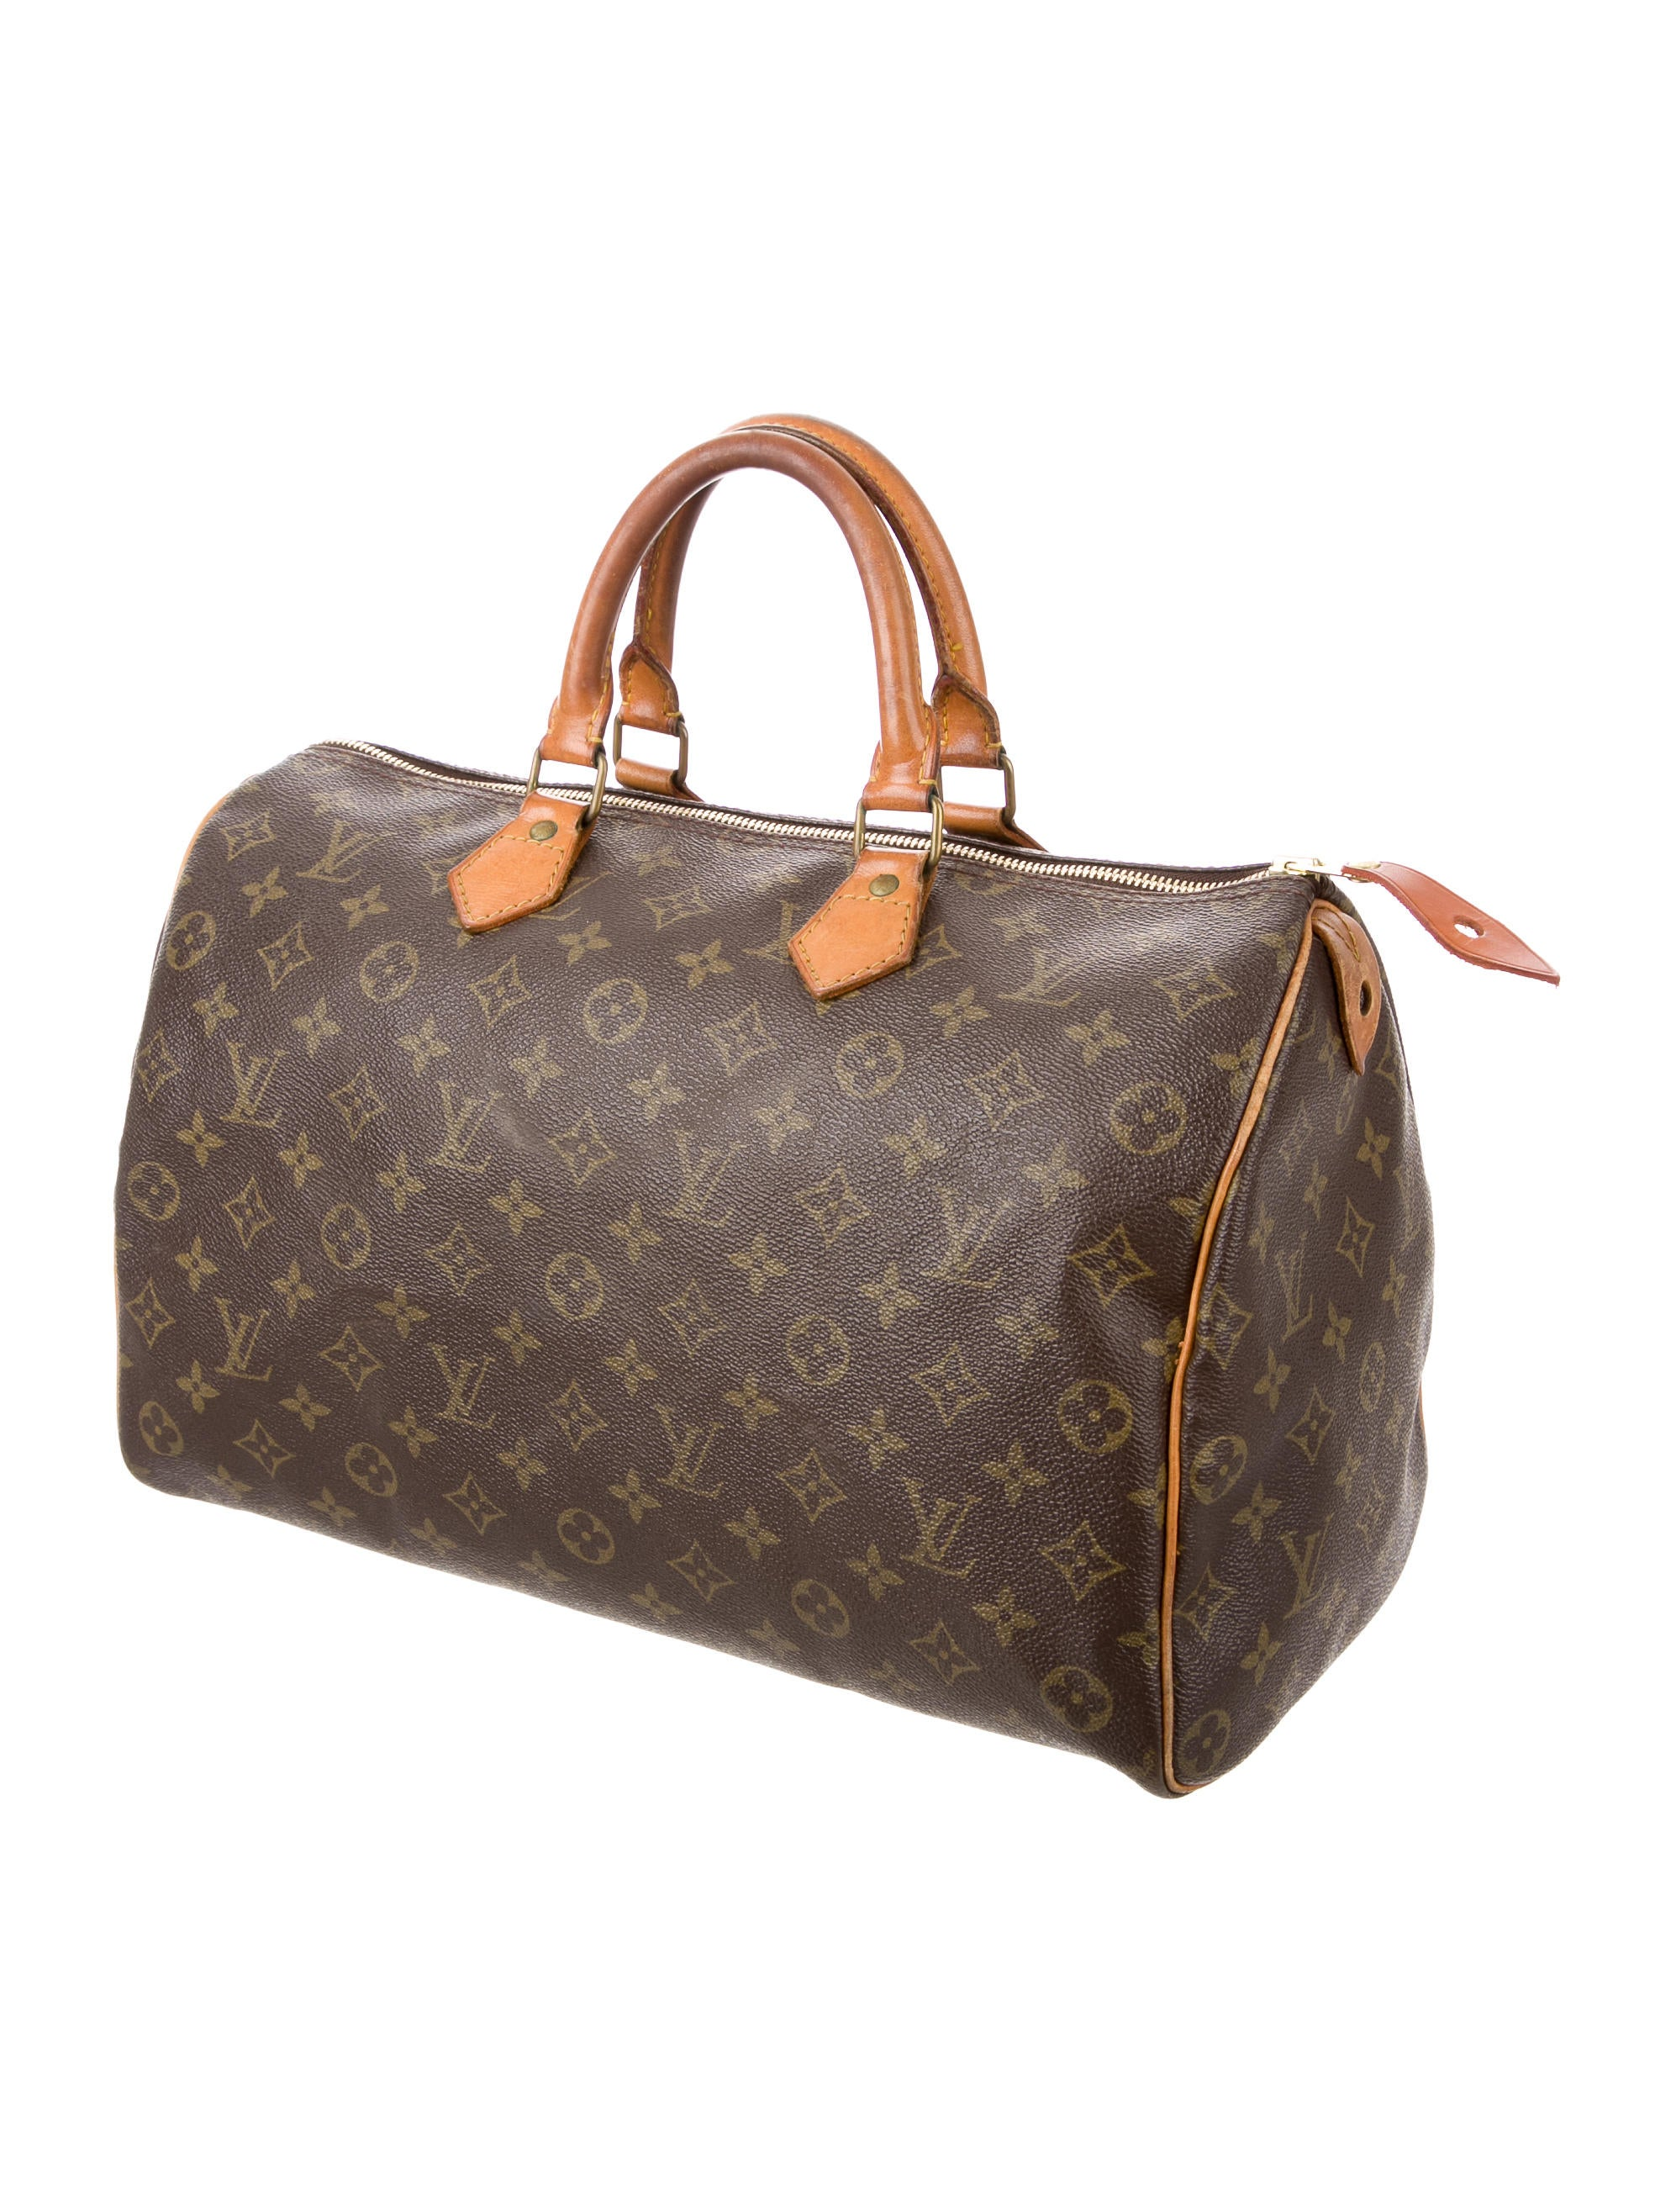 louis vuitton monogram speedy 35 handbags lou107139. Black Bedroom Furniture Sets. Home Design Ideas